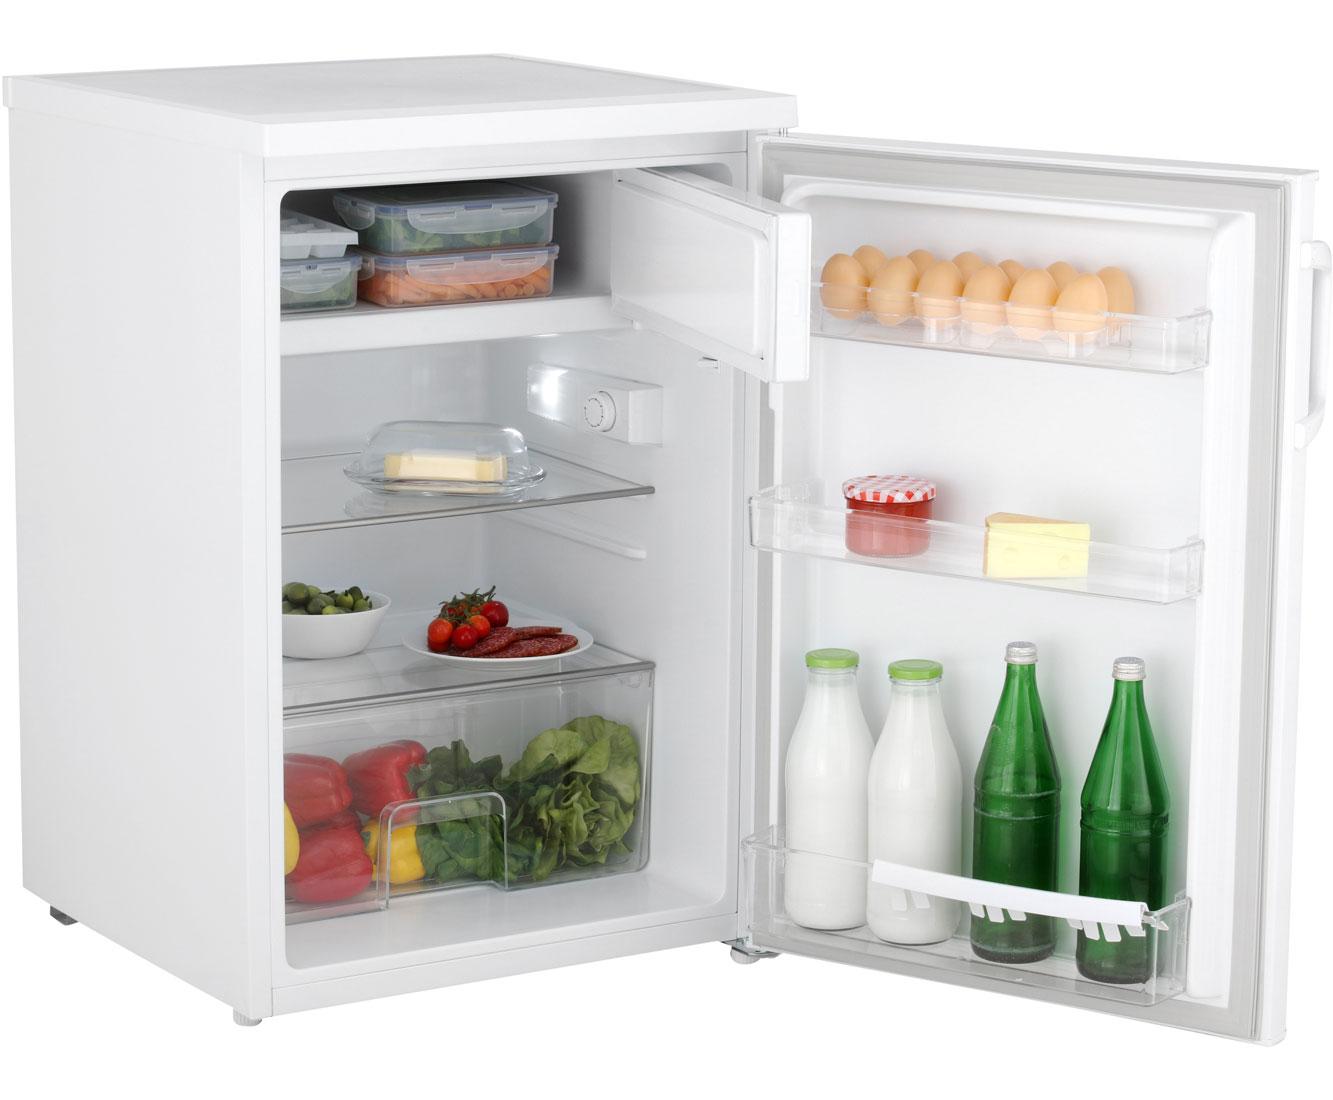 Bomann Kühlschrank Wasserauffangbehälter : Bomann kühlschrank thermostat: bomann kühl gefrierkombination kg ix